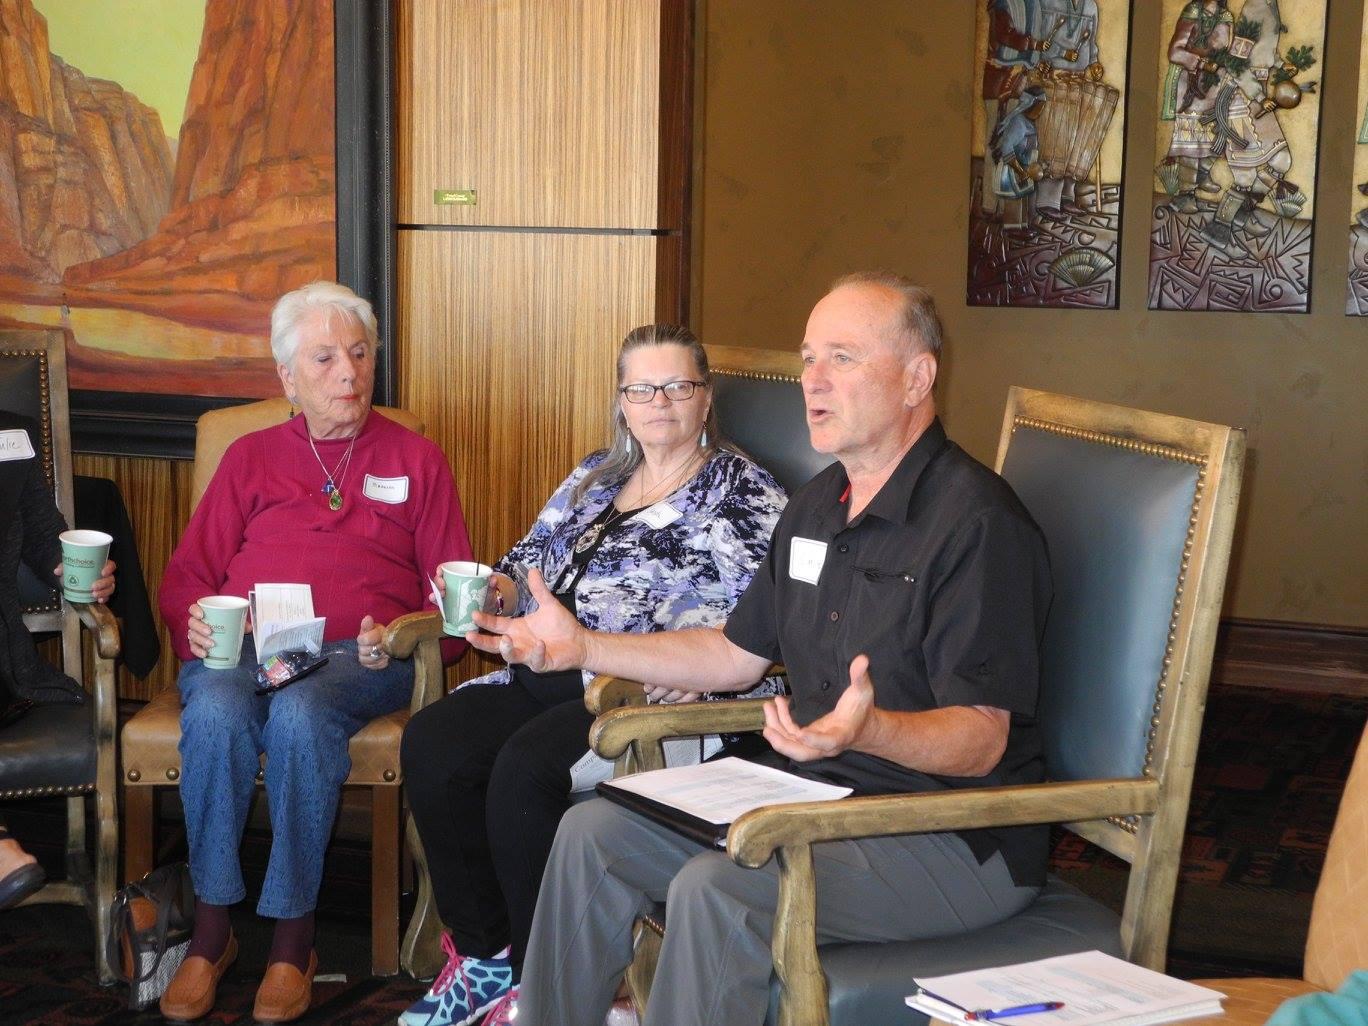 Dale Joel discusses cohousing with prospective candidates, St. George, Utah, Nov. 19, 2016 | Photo courtesy of St. George Cohousing, St. George News